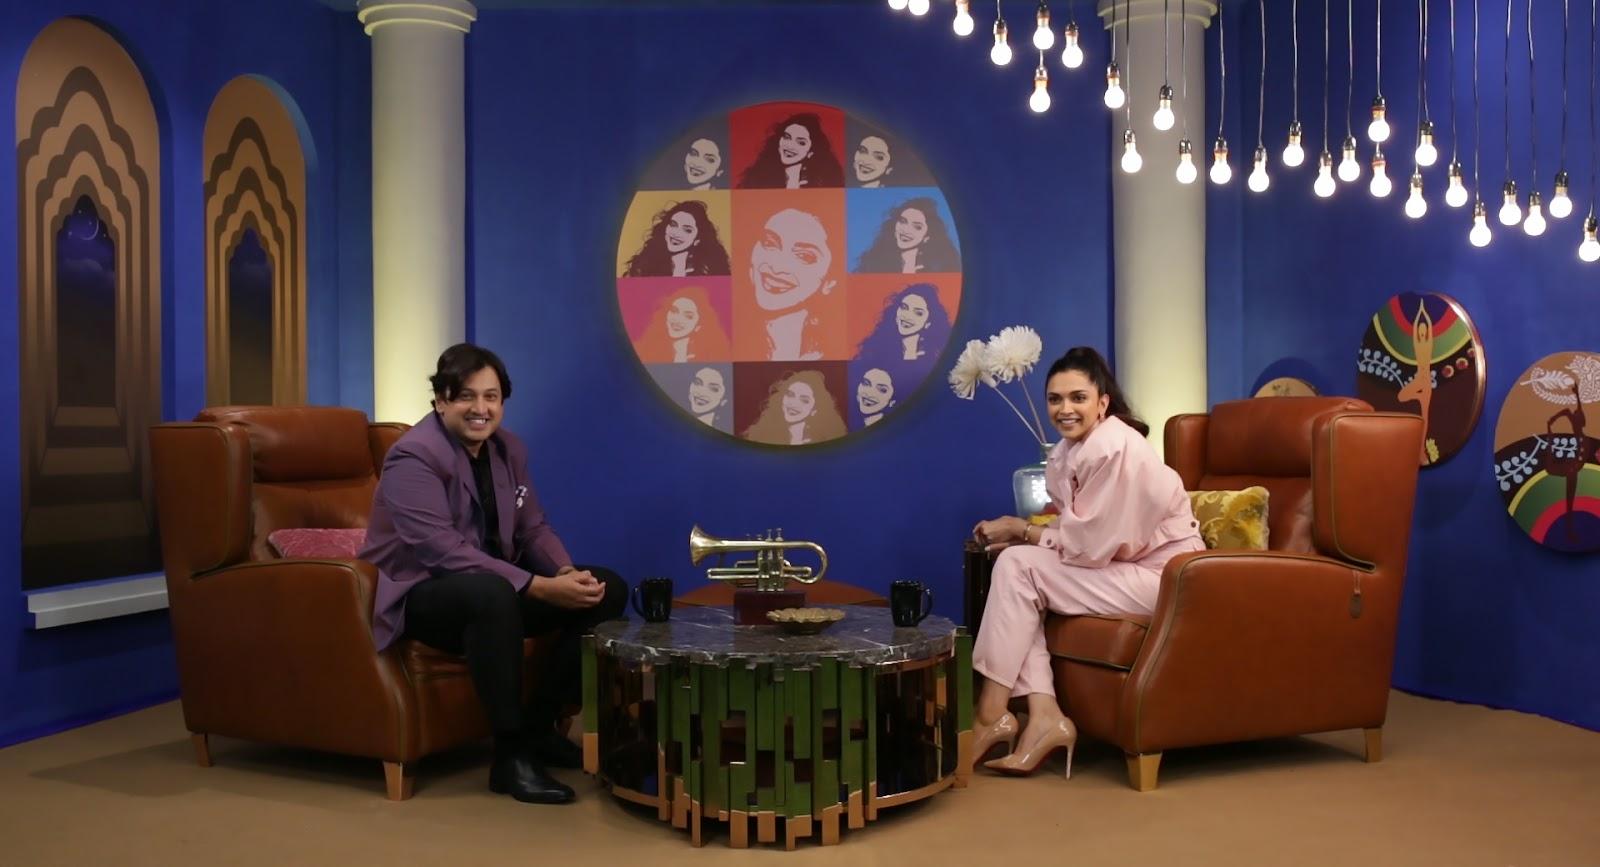 Deepika Padukone' to feature in 'Kiska Brand Bajega'